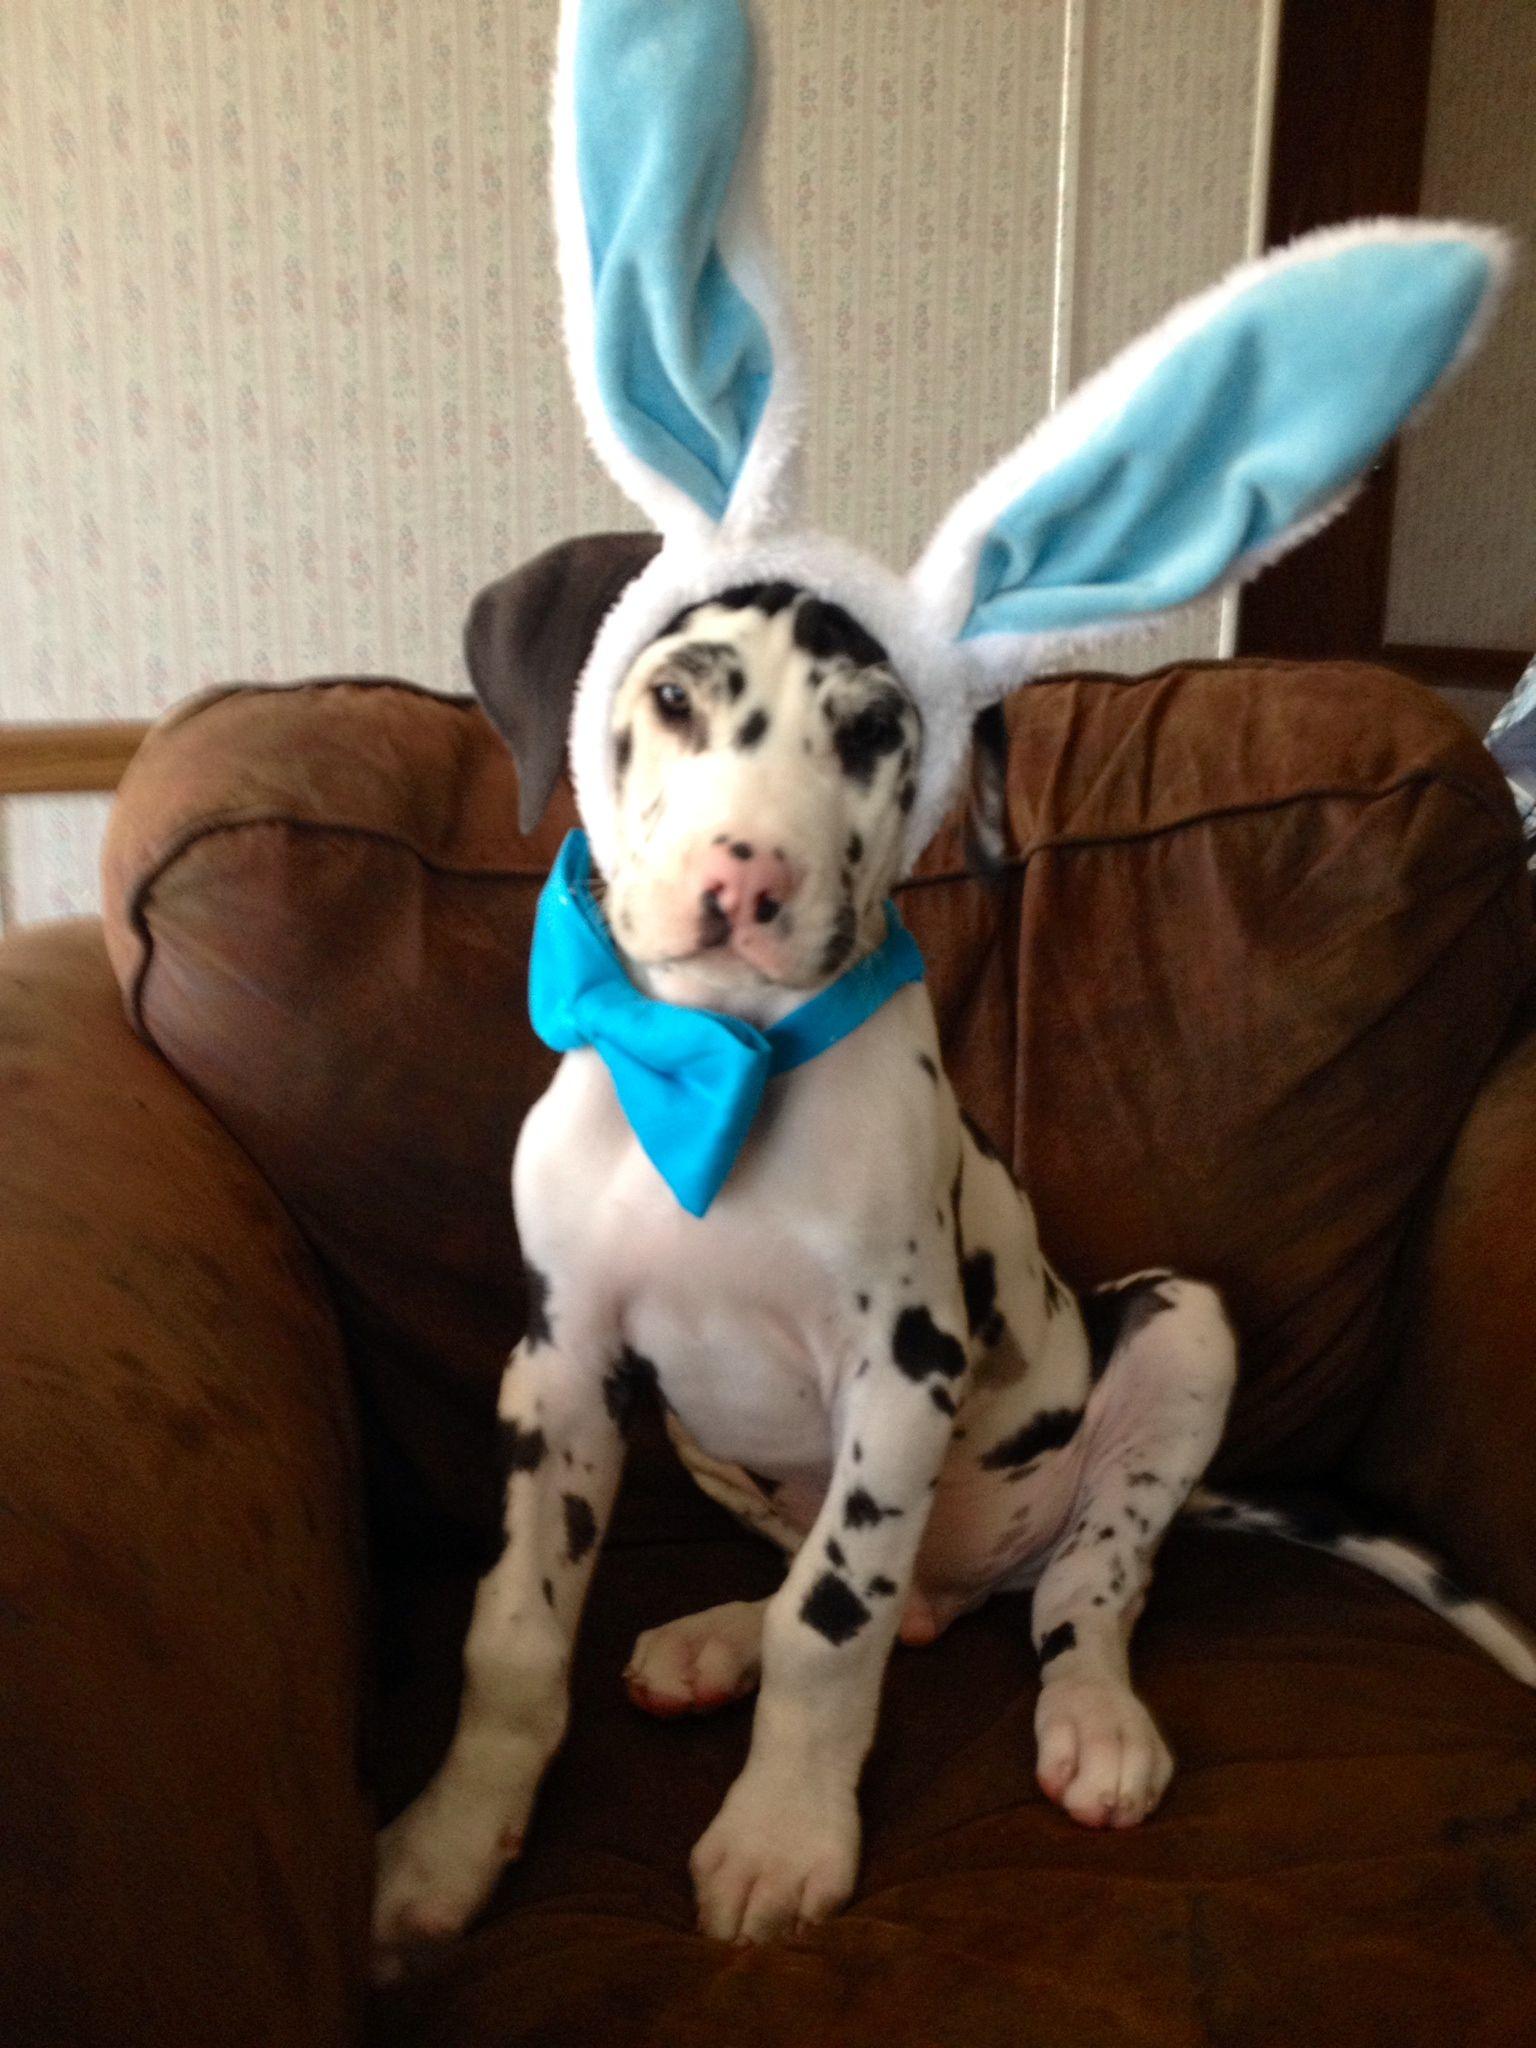 Here comes Samson the Bunny ) Deutsche doggen, Deutsche